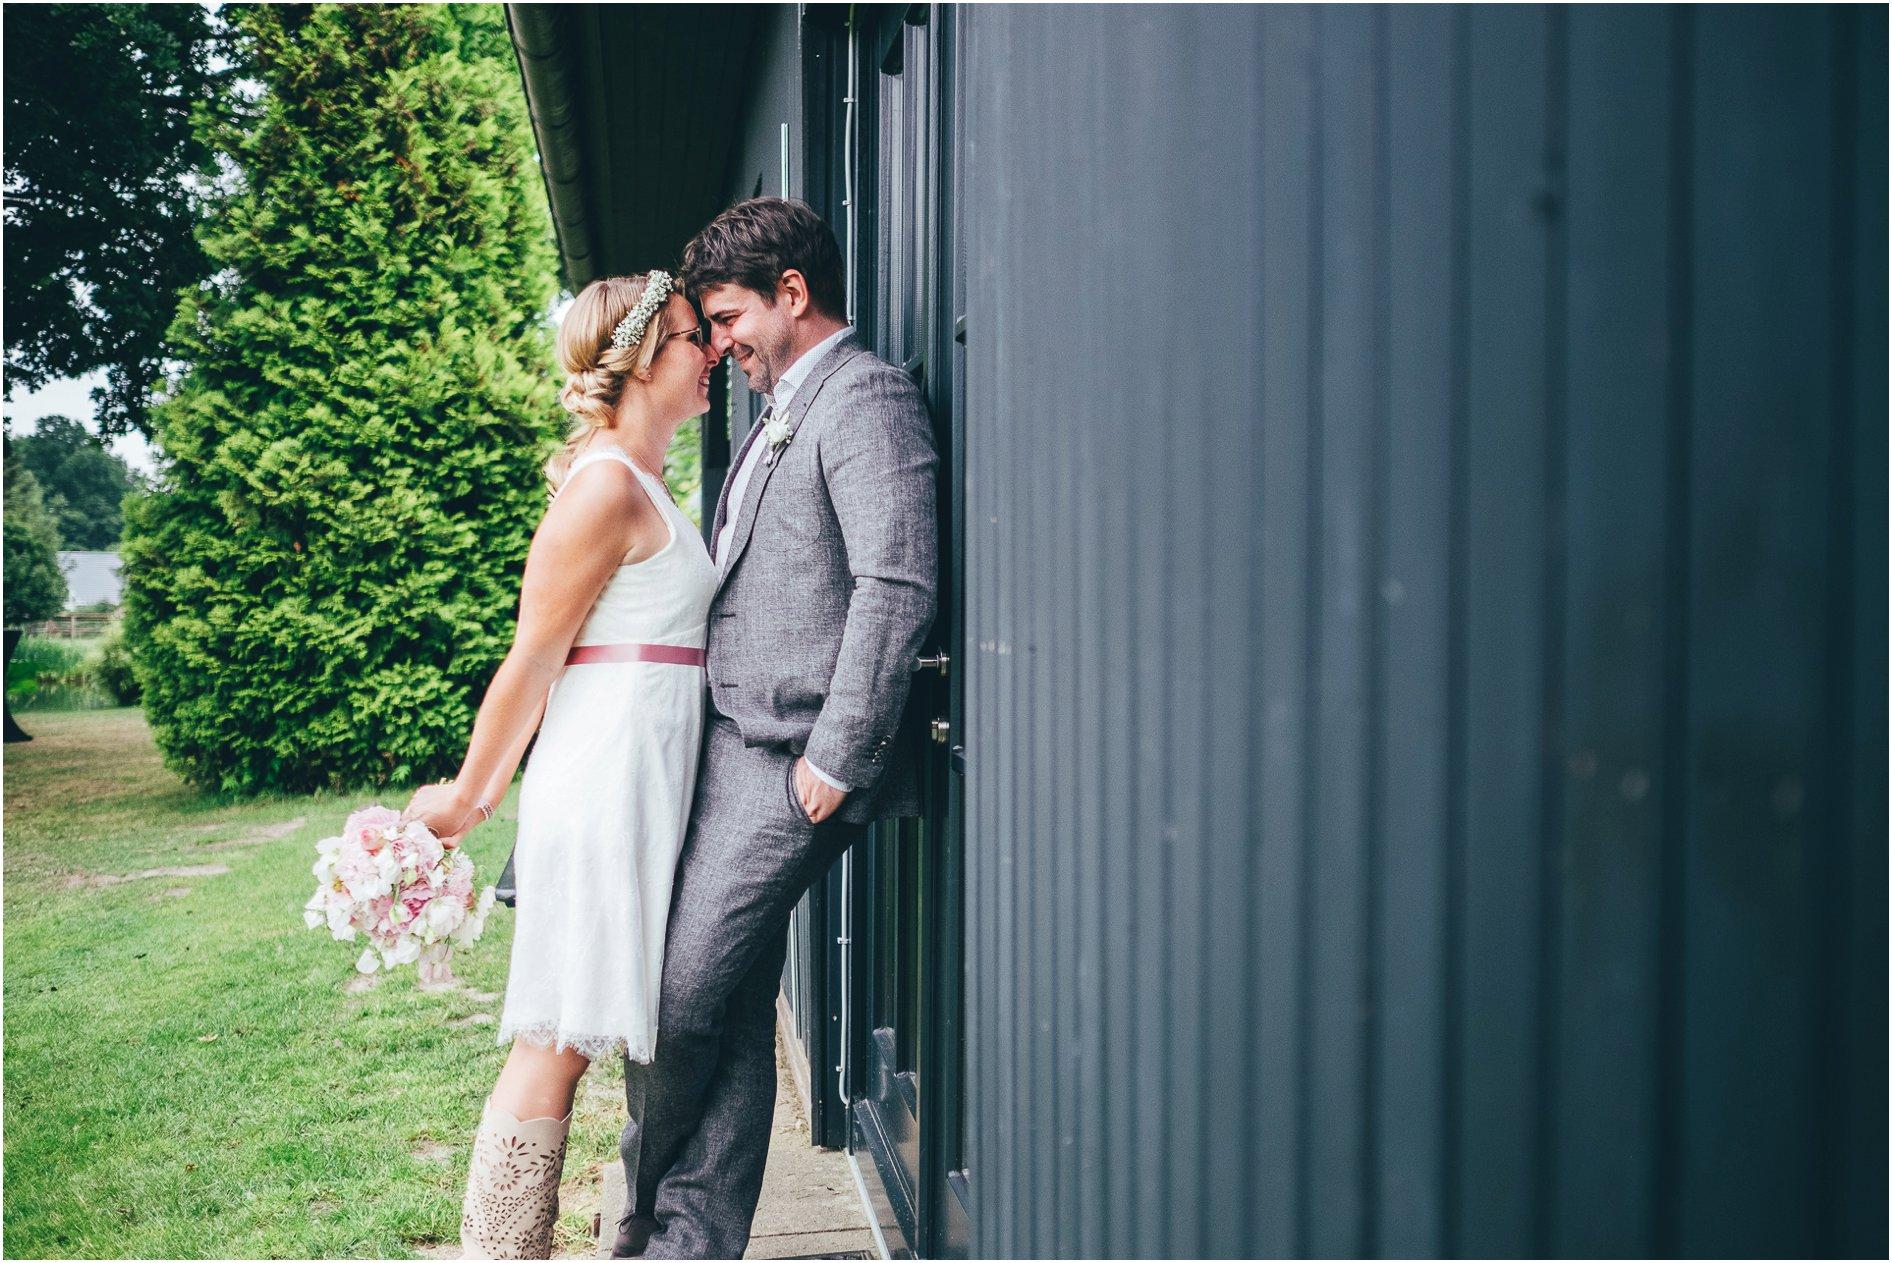 Sandra & Janis – Hochzeitsfotograf in Seevetal